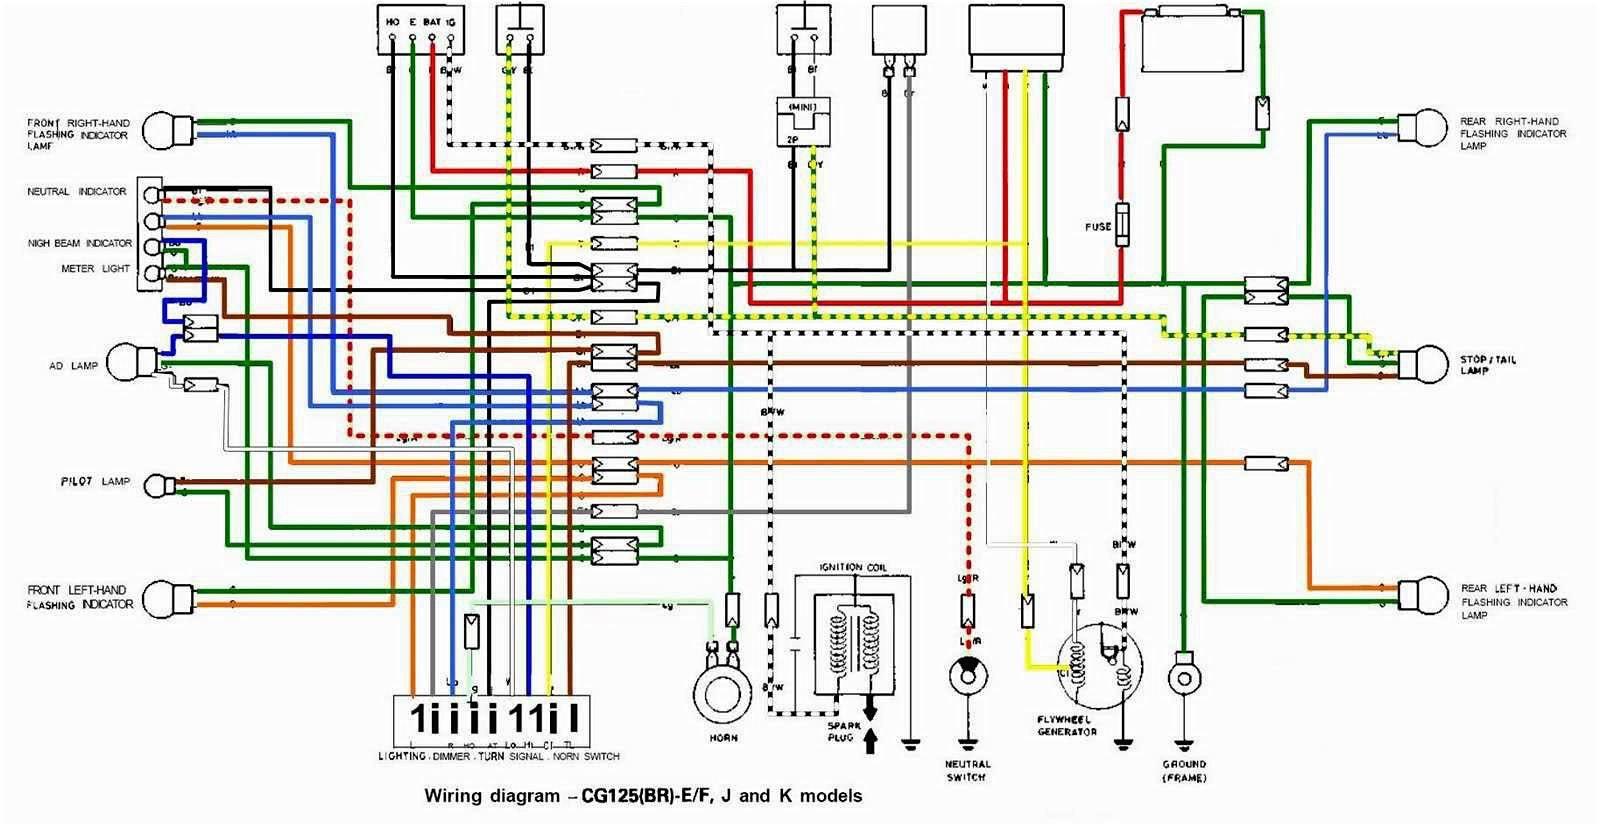 Zongshen 200 Wiring Diagram Schematics Diagrams Atv Automotive Library U2022 Rh Seigokanengland Co Uk Wire Dirt Bike